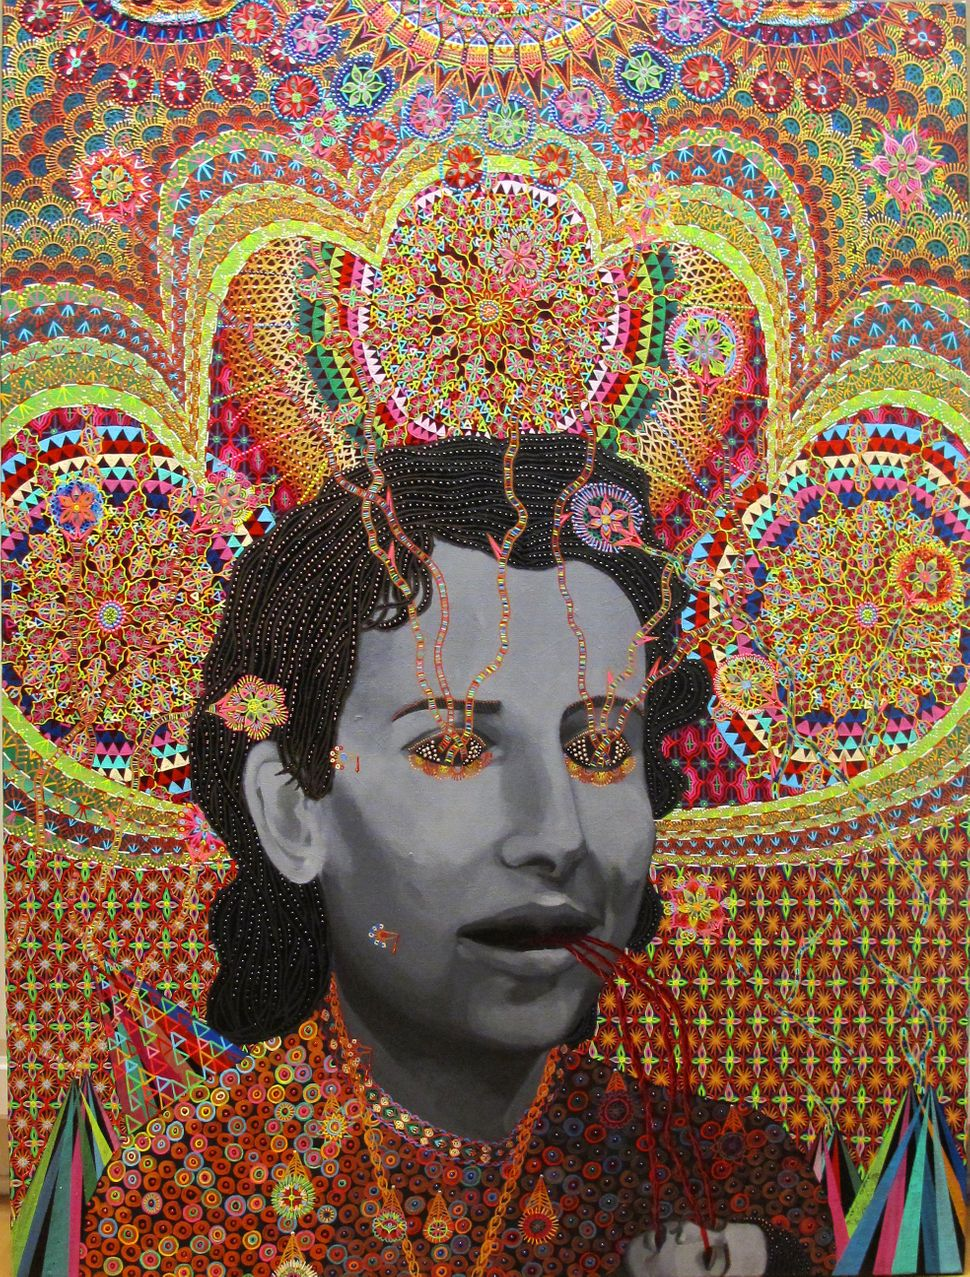 Les Femmes D'Alger #17, 48x36 inches, 2012